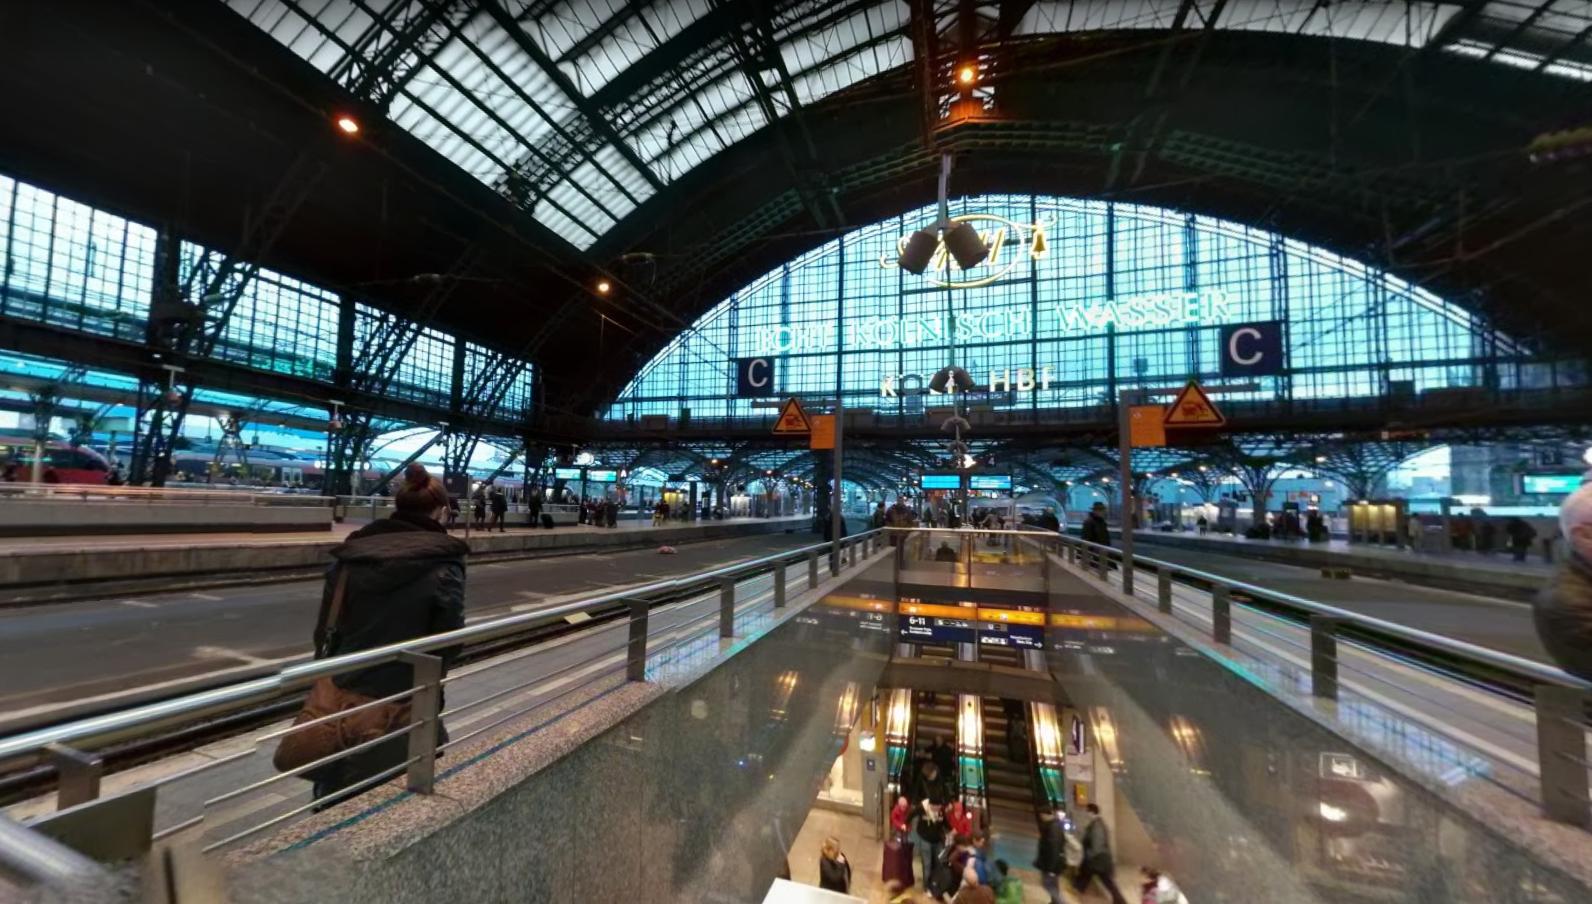 estacio tren colonia google maps